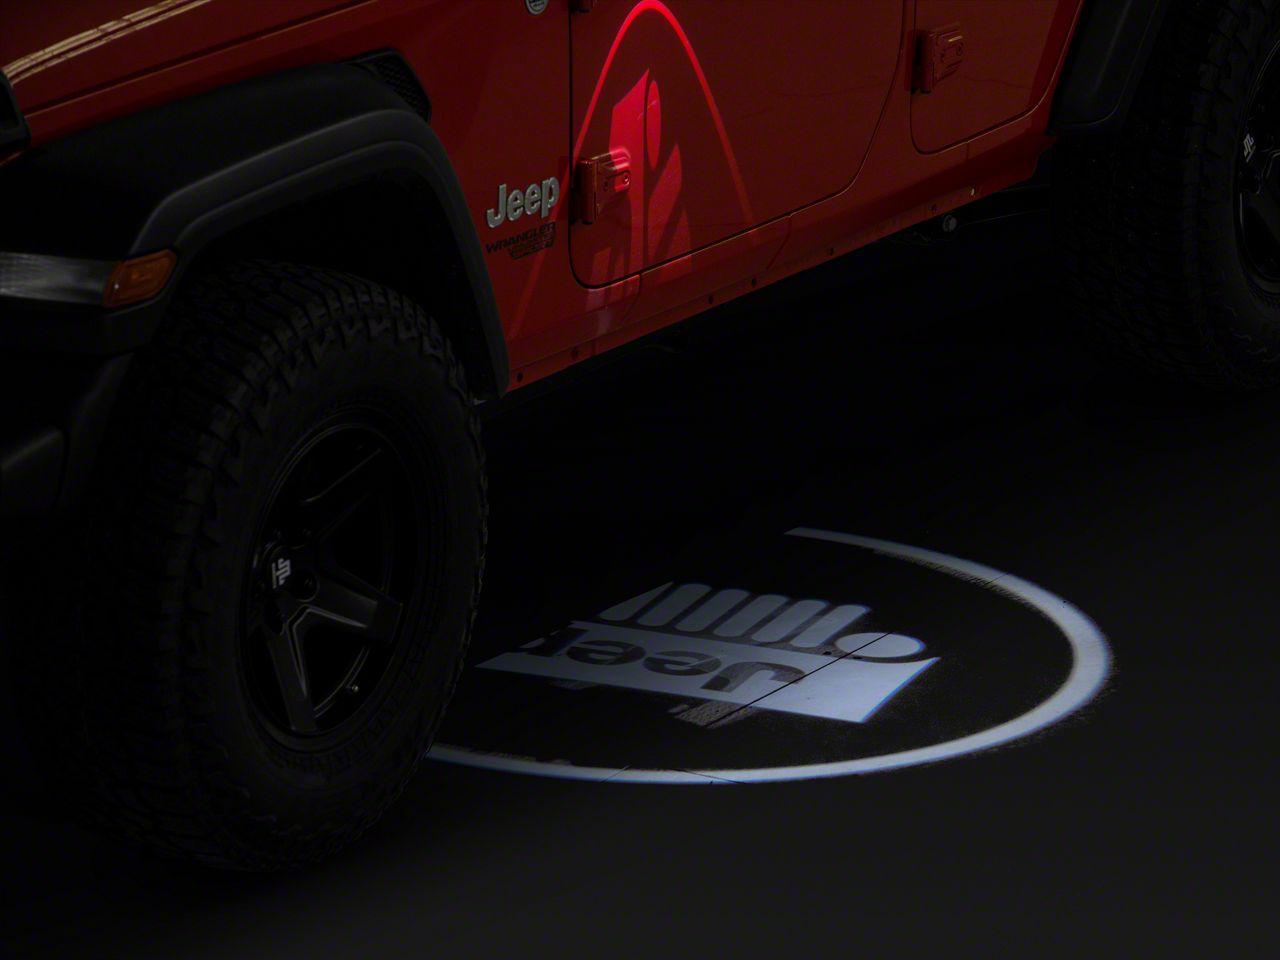 Oracle LED Door Projectors - JEEP Logo (87-18 Jeep Wrangler YJ, TJ, JK & JL)